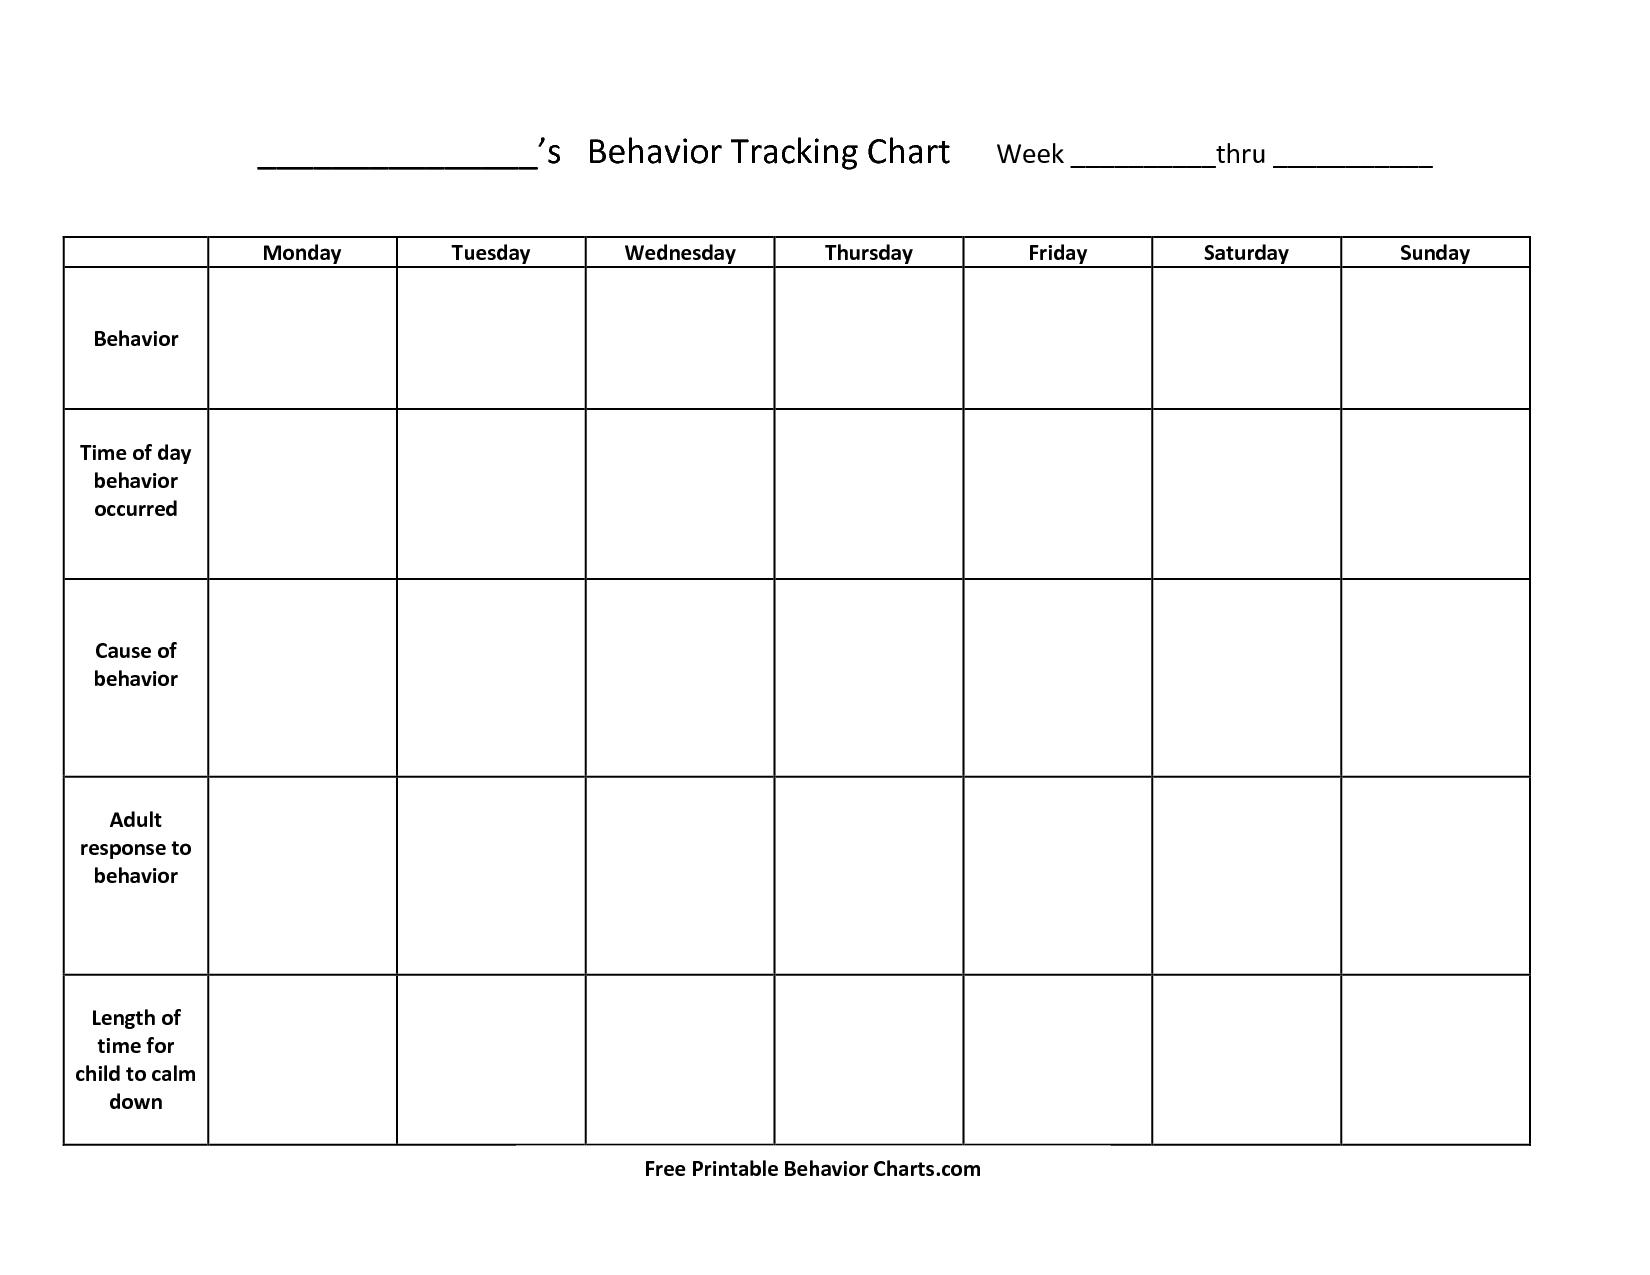 Free+Printable+Behavior+Charts+For+Teachers | Things To Try - Free Printable Incentive Charts For Teachers